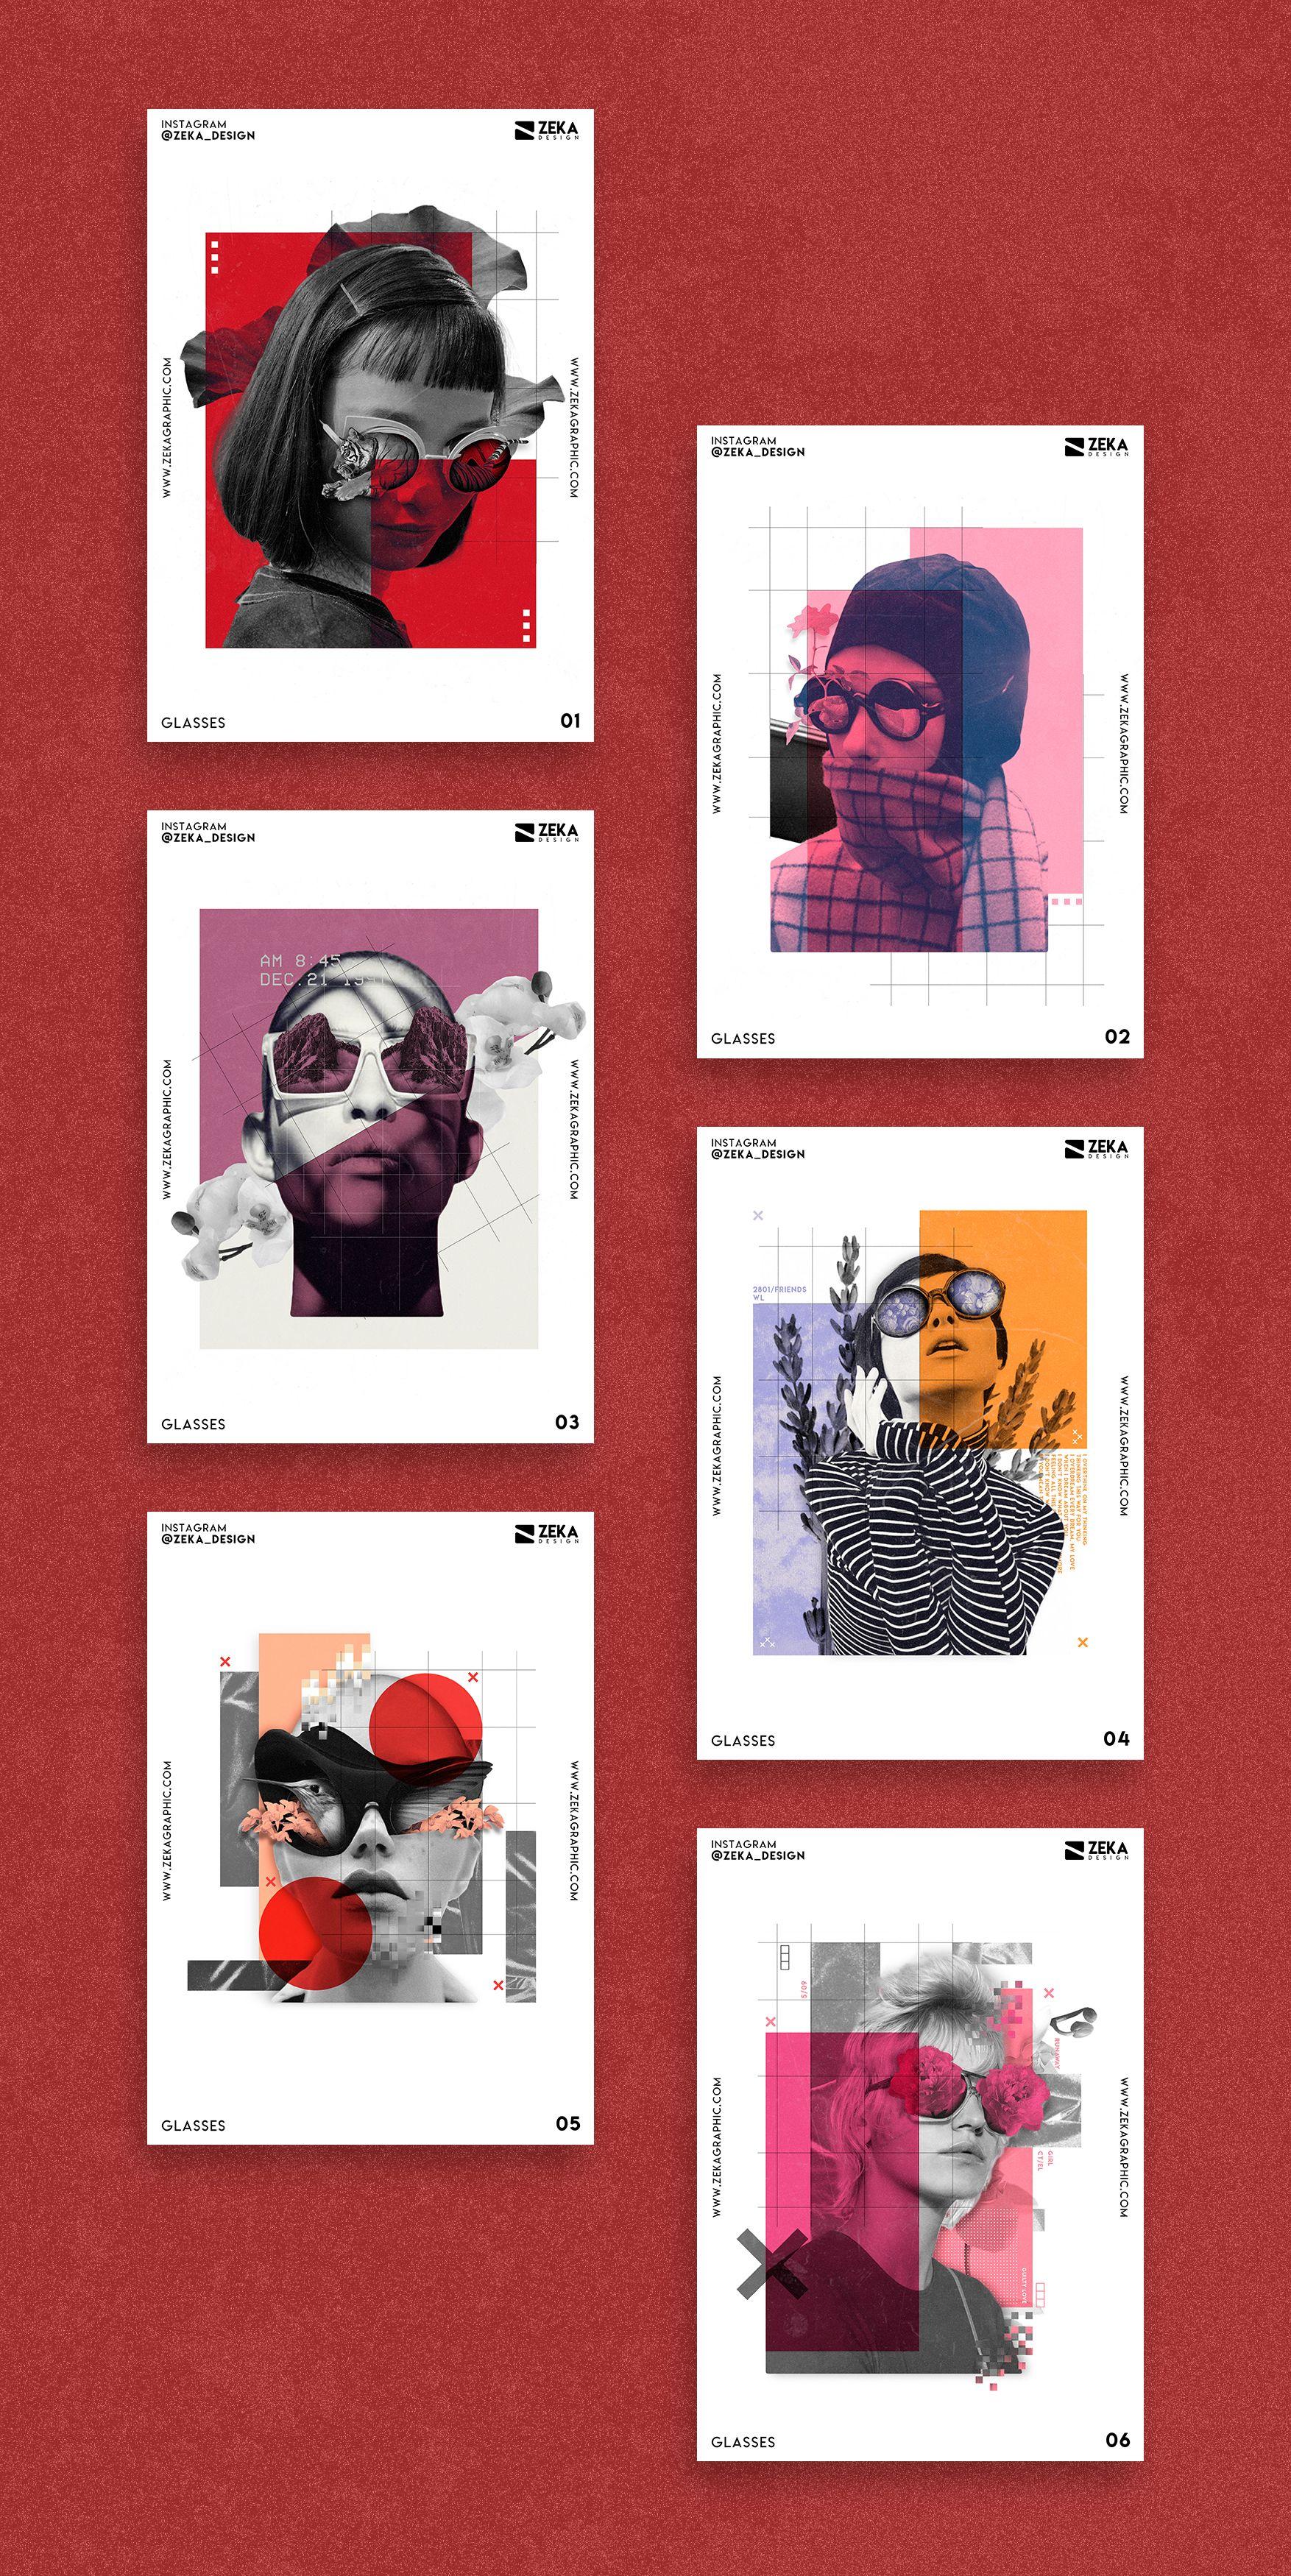 Glasses Poster Design Inspiration Project Minimalist And Creative Graphic Design Graphic Design Layouts Creative Graphic Design Graphic Design Photoshop